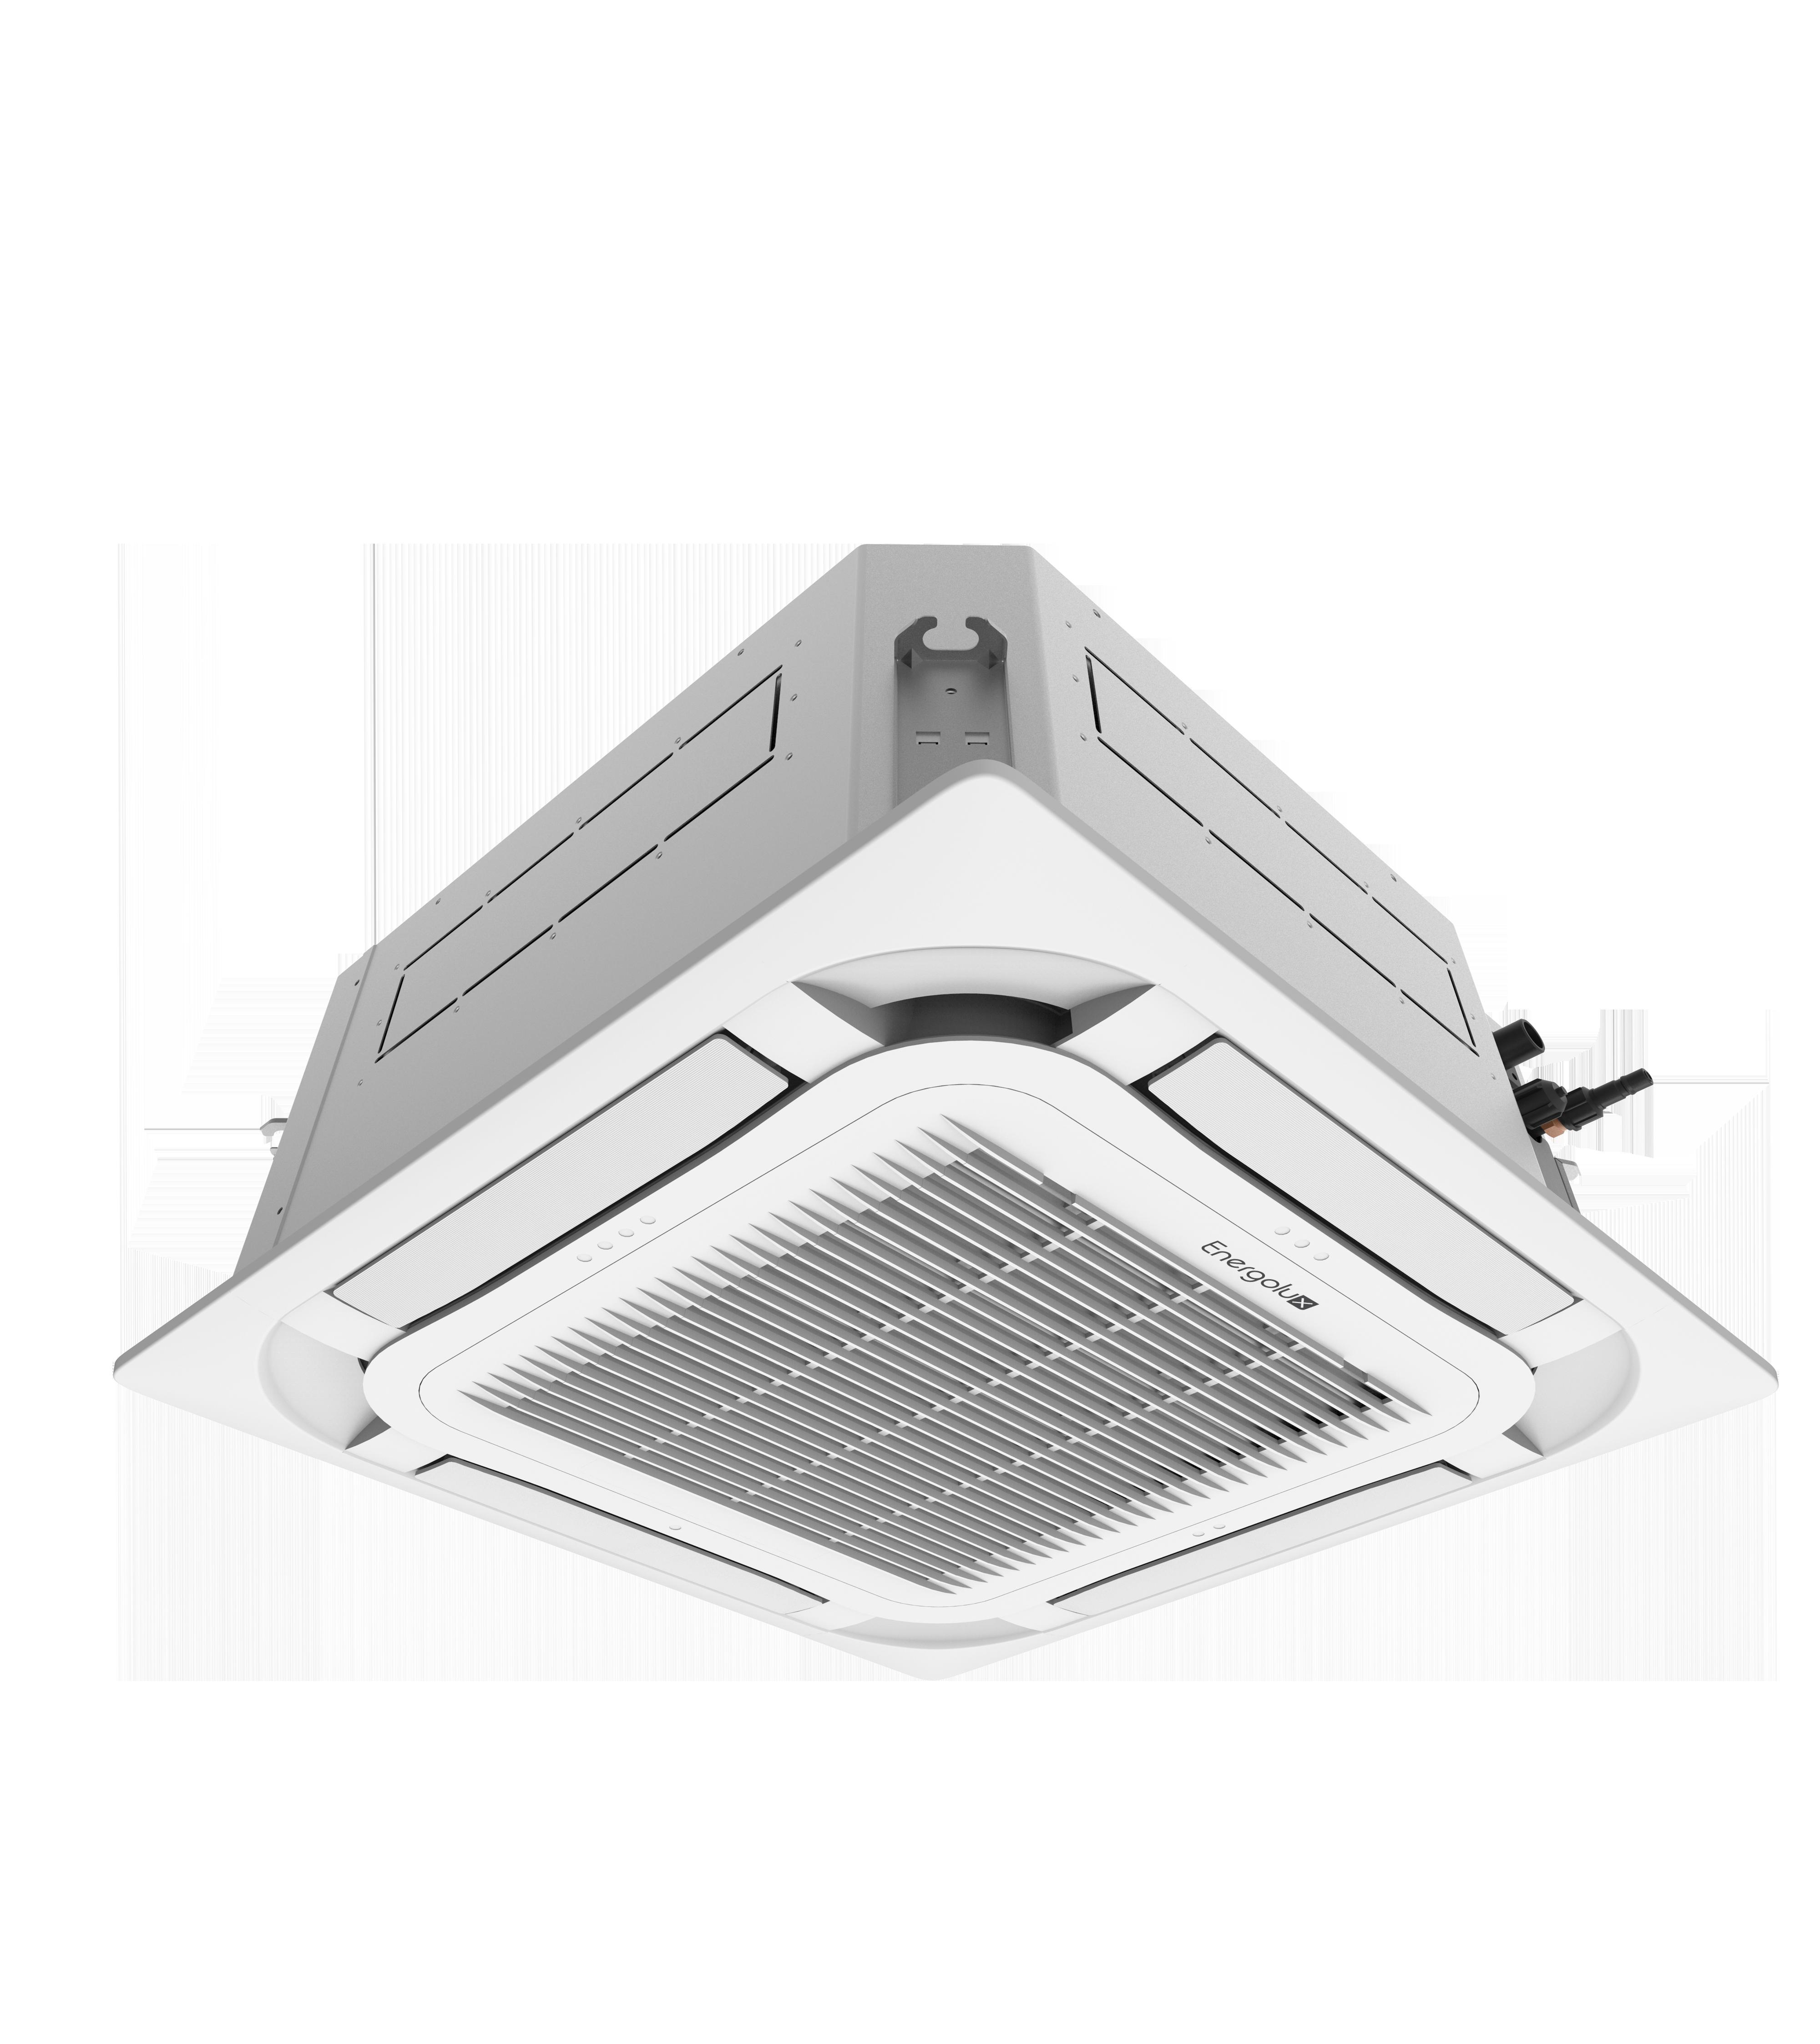 Energolux SMZCC06V3AI